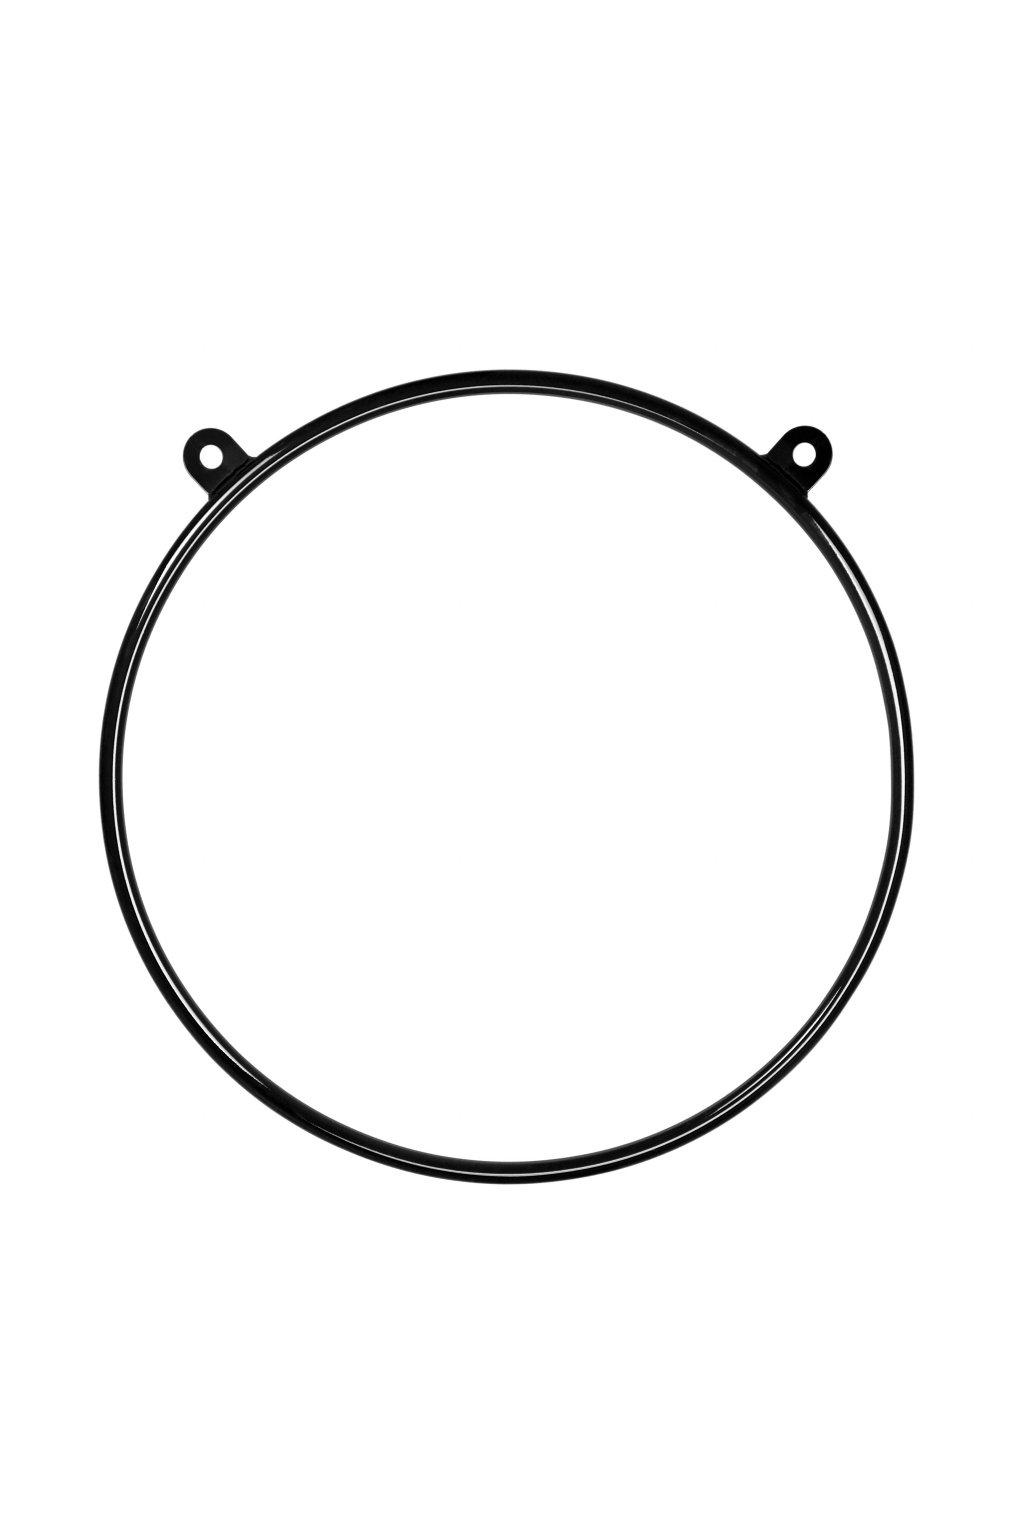 obruc dvoubod cerna 1000px (1)